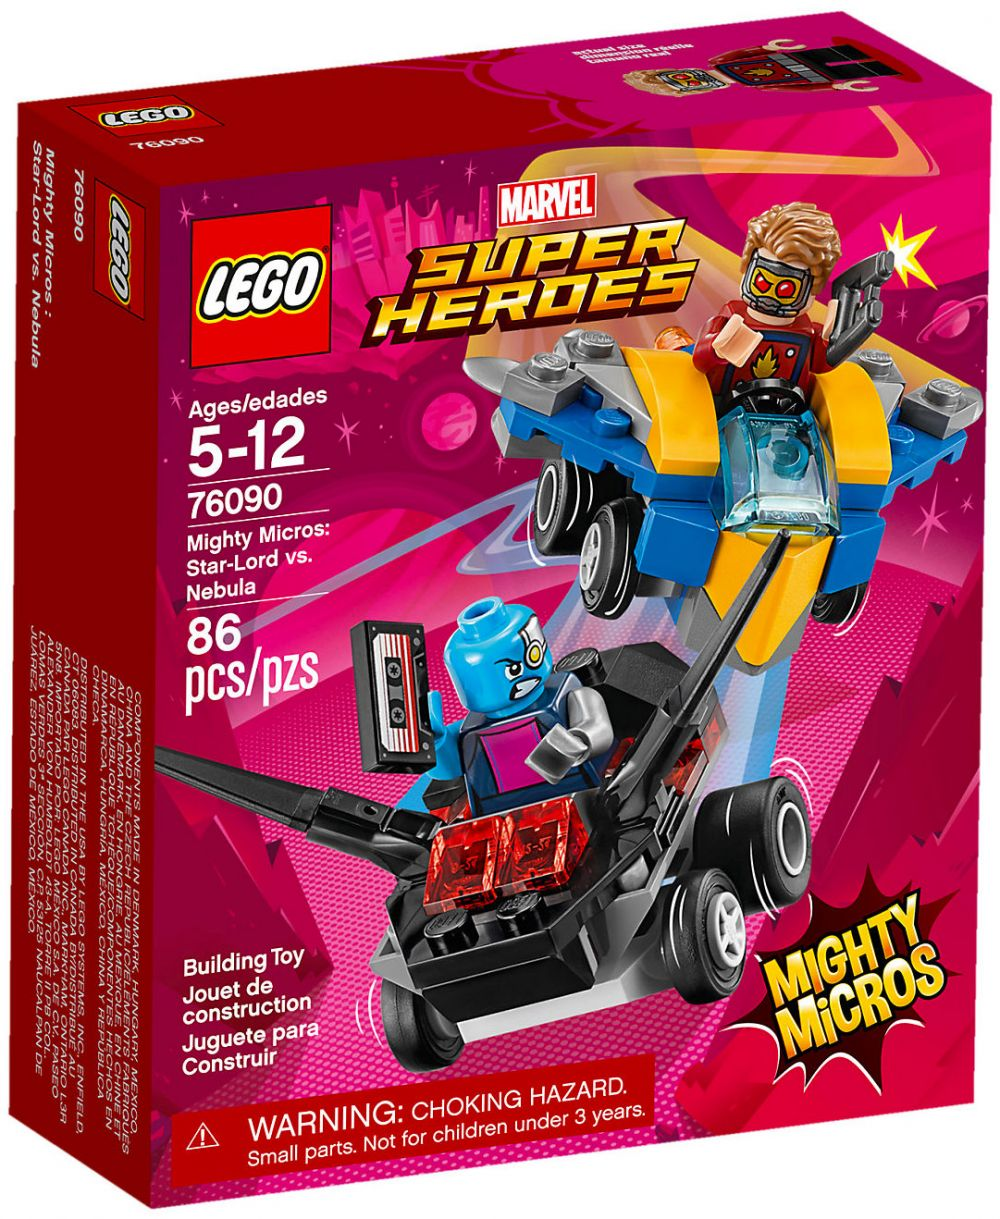 Lord Contre Nebula Marvel Super Heroes Lego 76090 MicrosStar Mighty qUMzSVGp